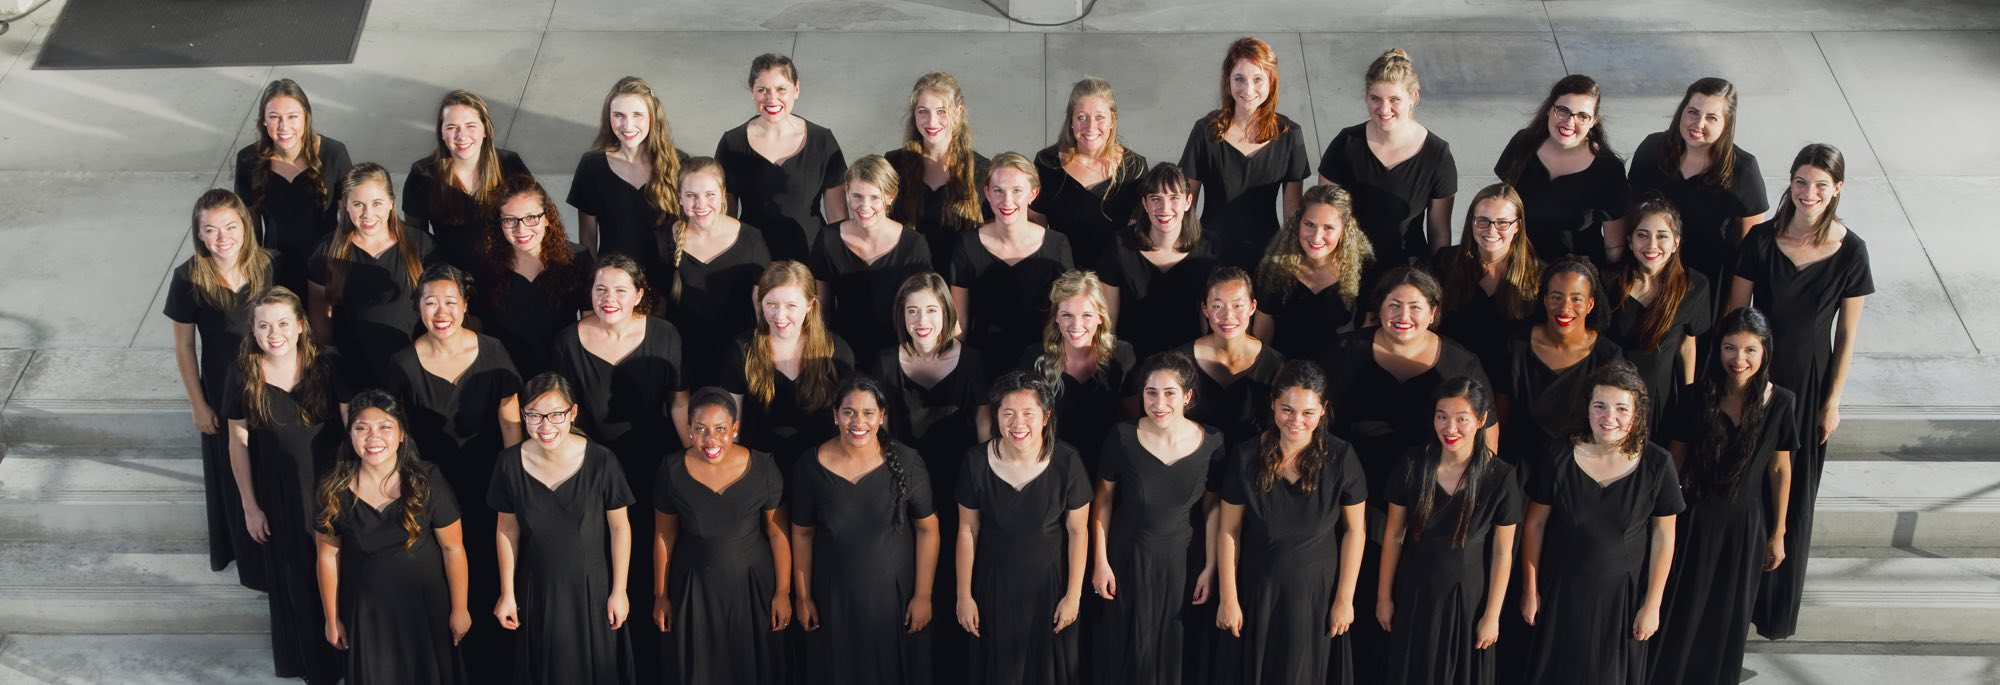 Biola womens chorus